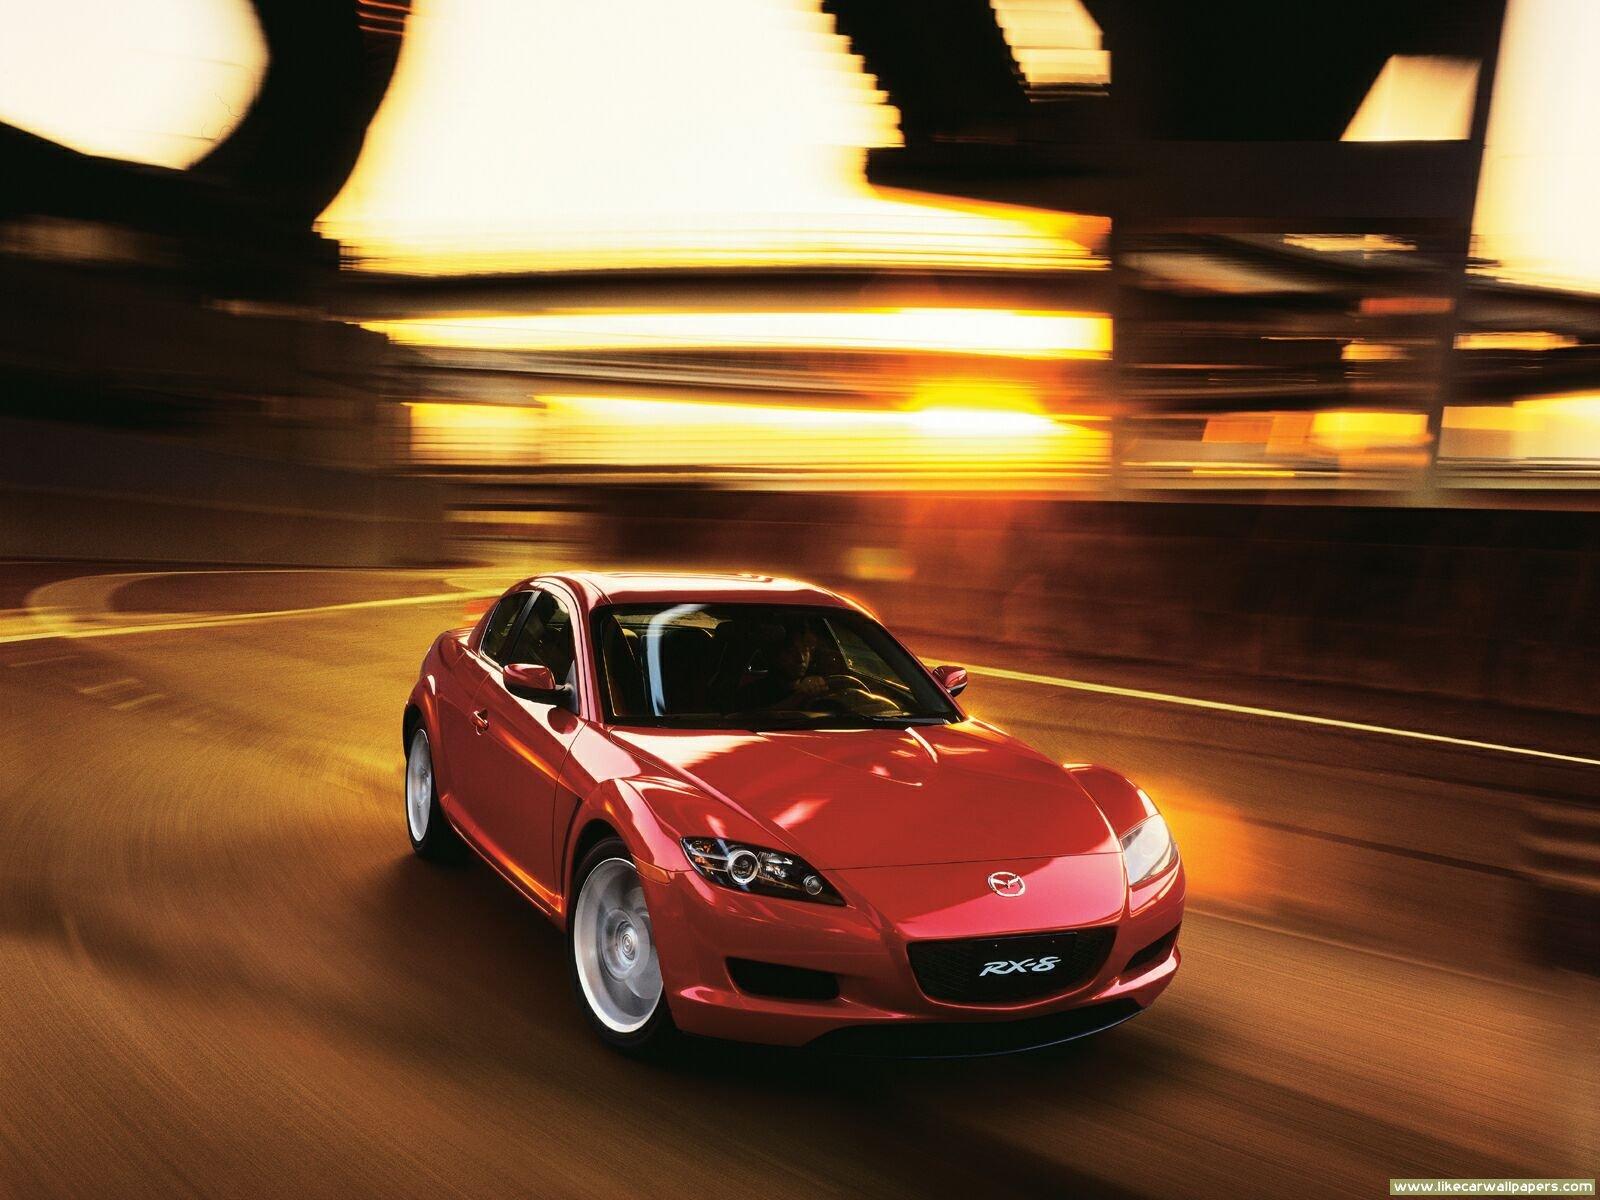 Mazda Cars HD Wallpapers Wallpaper202